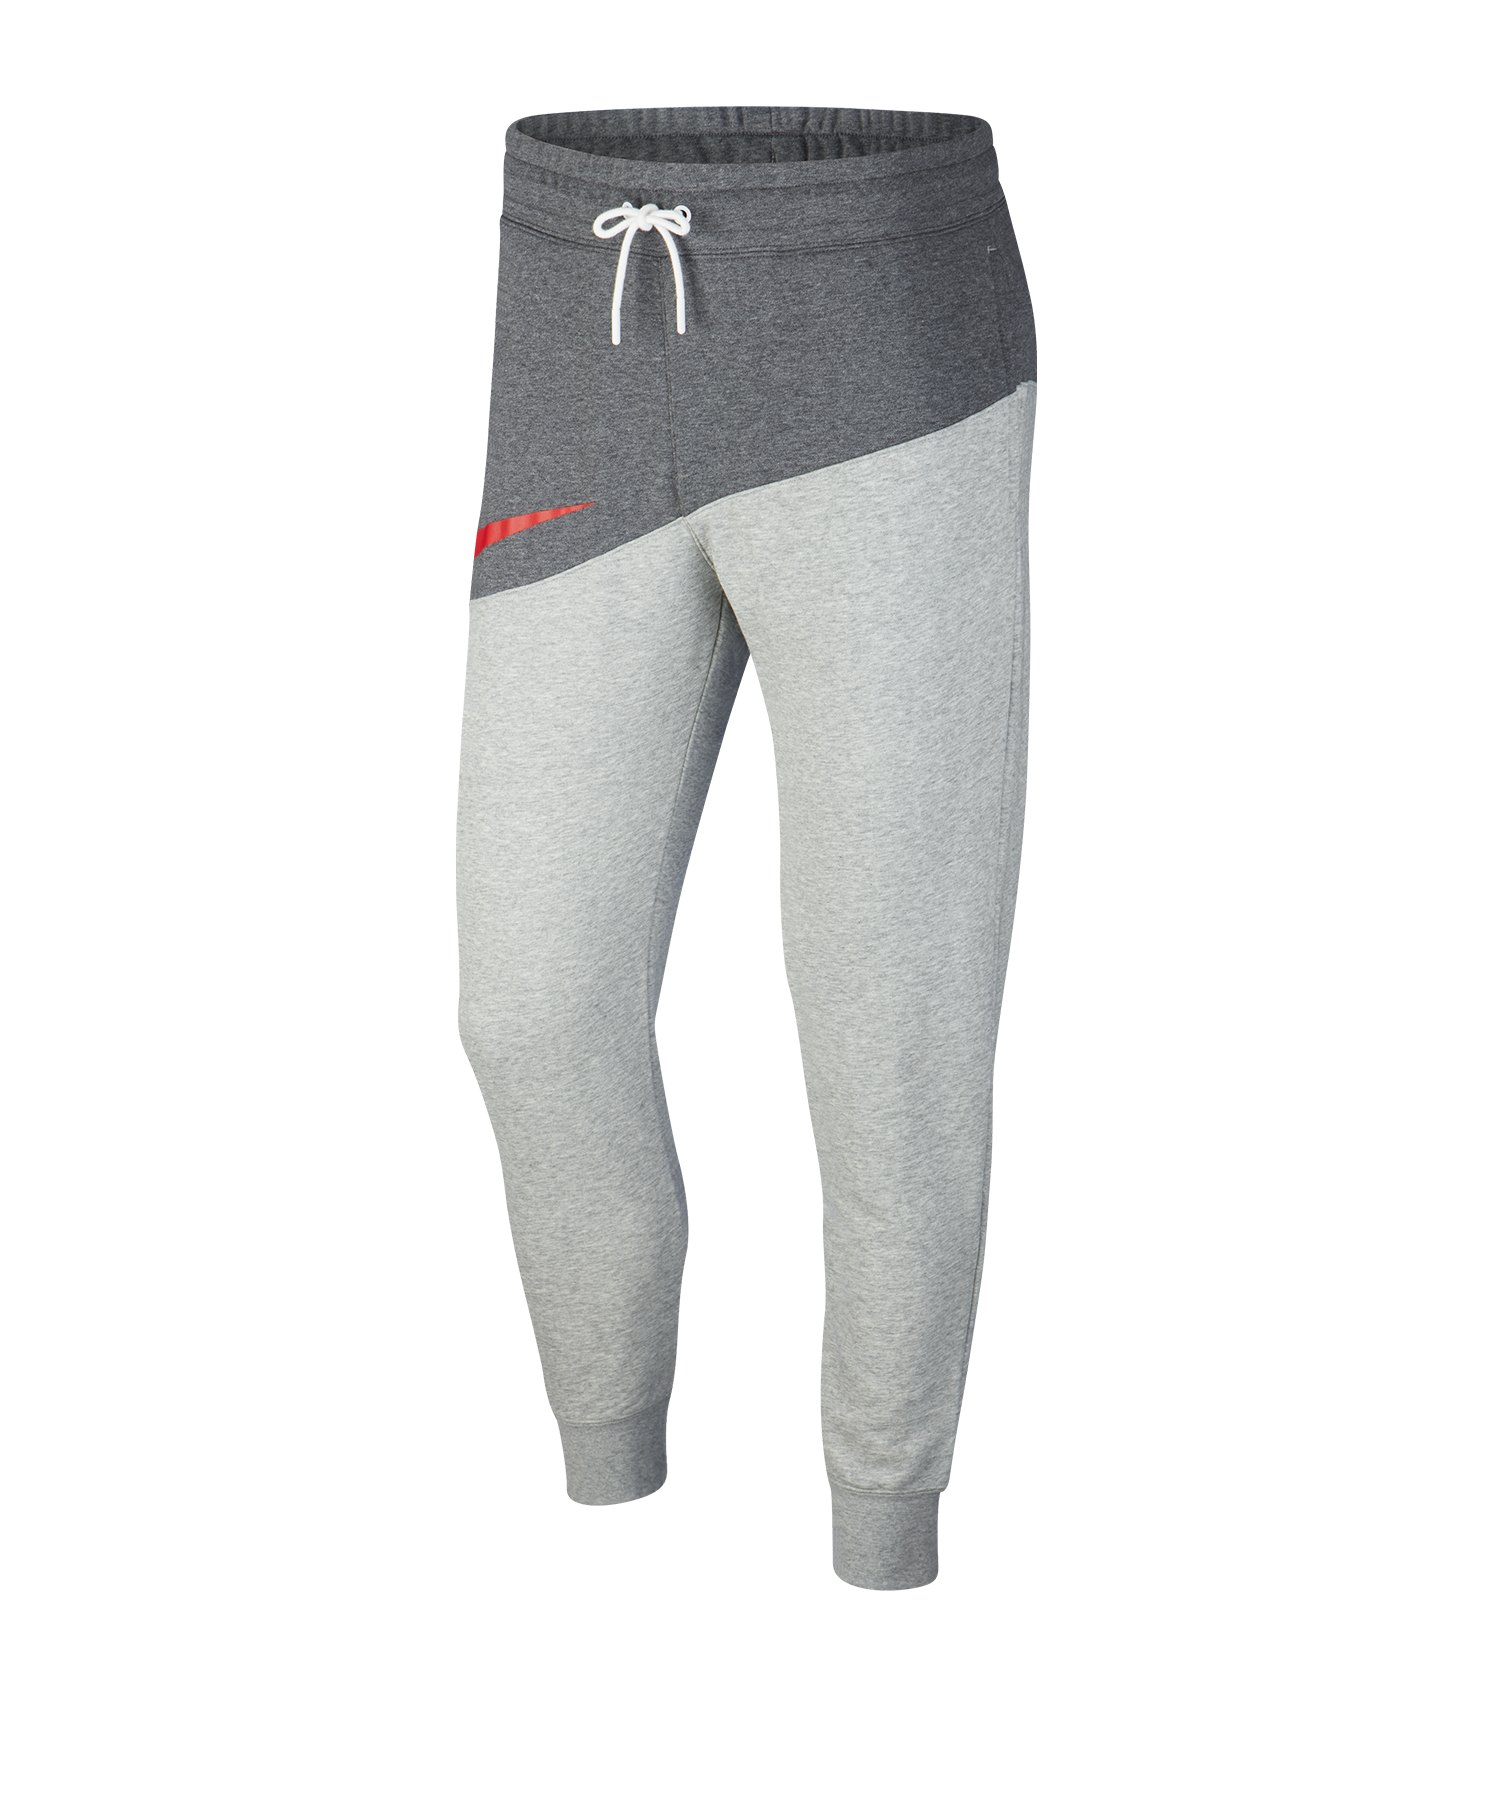 Nike Swoosh Jogginghose Grau F071 - grau